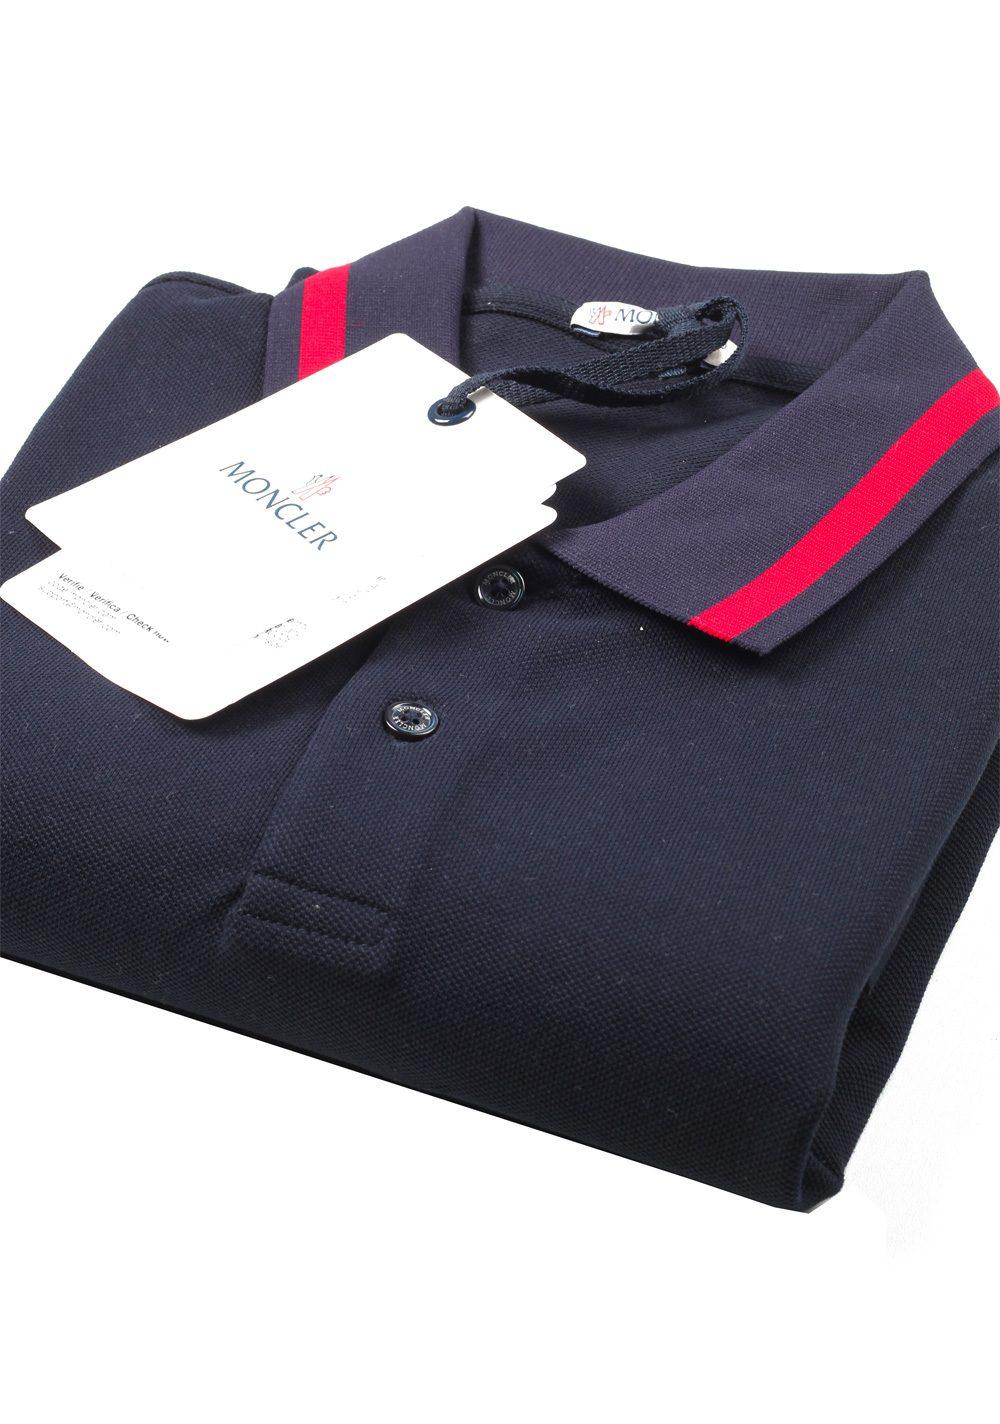 12c4f460231d Moncler Long Sleeve Polo Shirt Size M   38R U.S. Navy